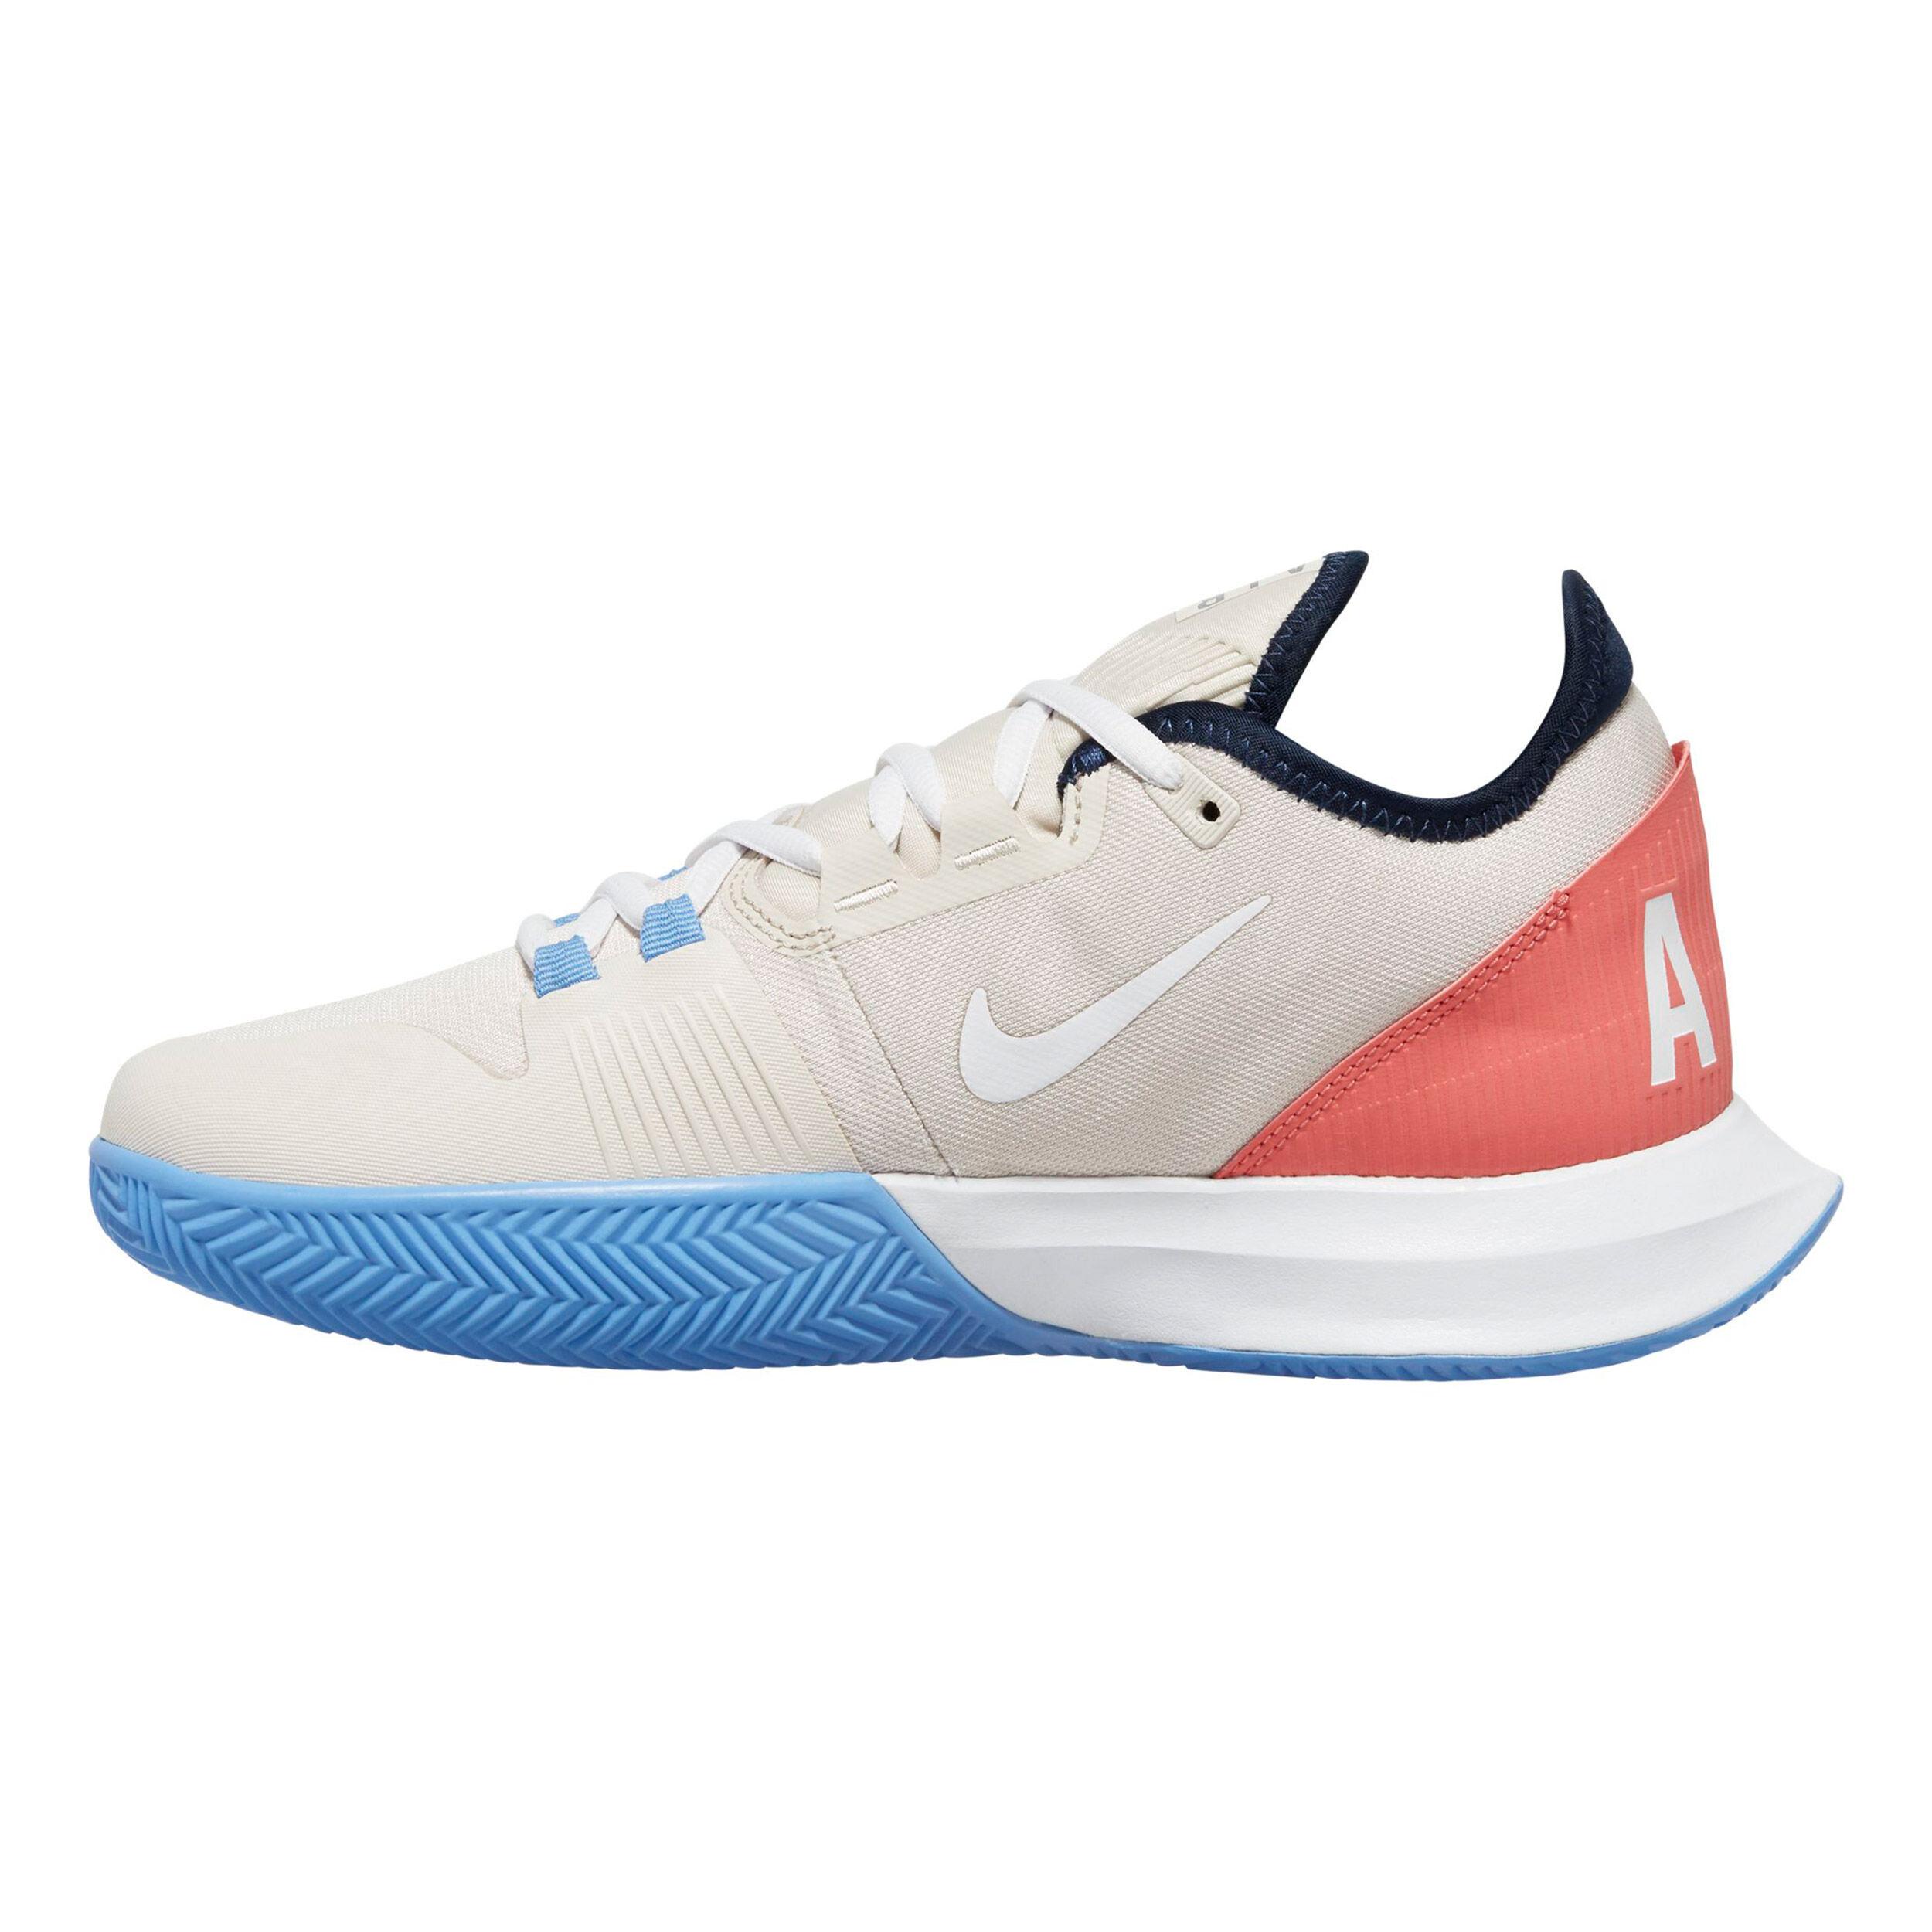 Nike Air Max Wildcard Clay Sandplatzschuh Damen Creme, Koralle